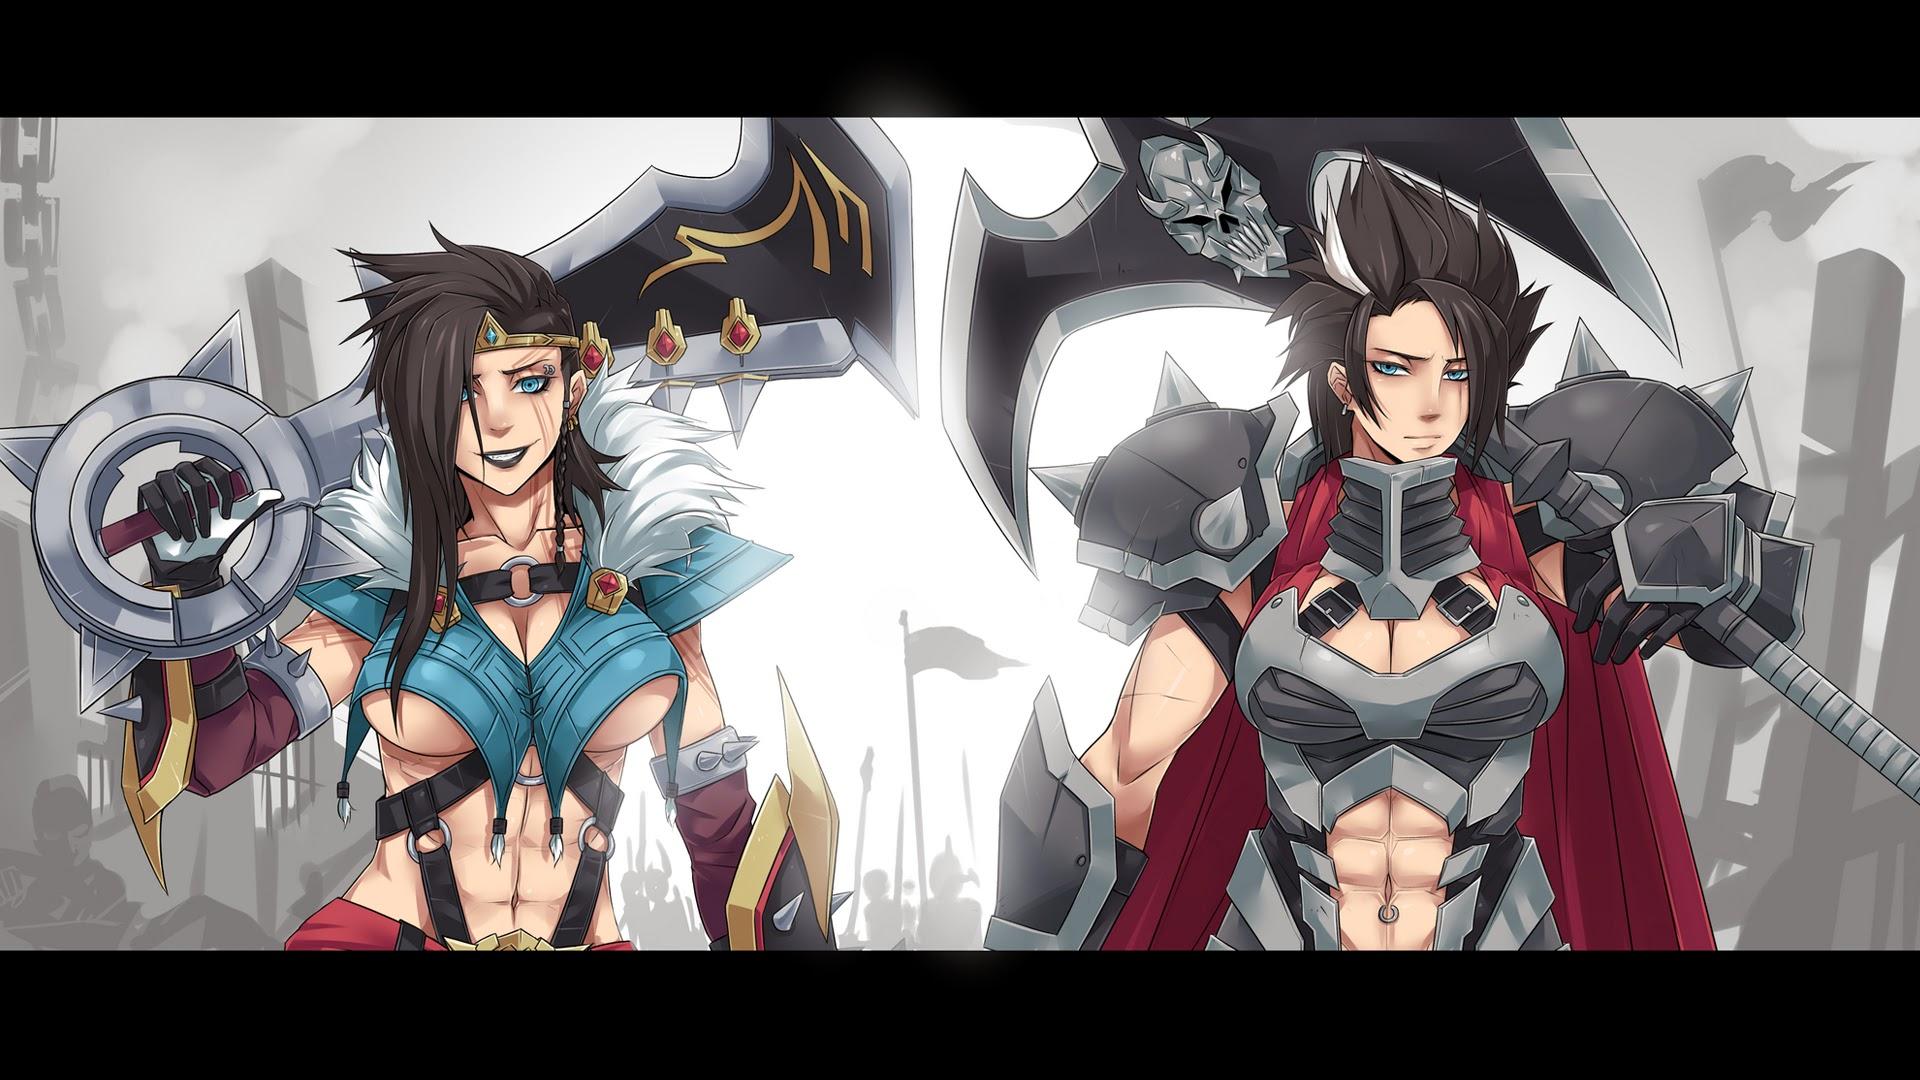 girl draven and darius league of legends hd wallpaper lol champion    League Of Legends Wallpaper Darius Draven